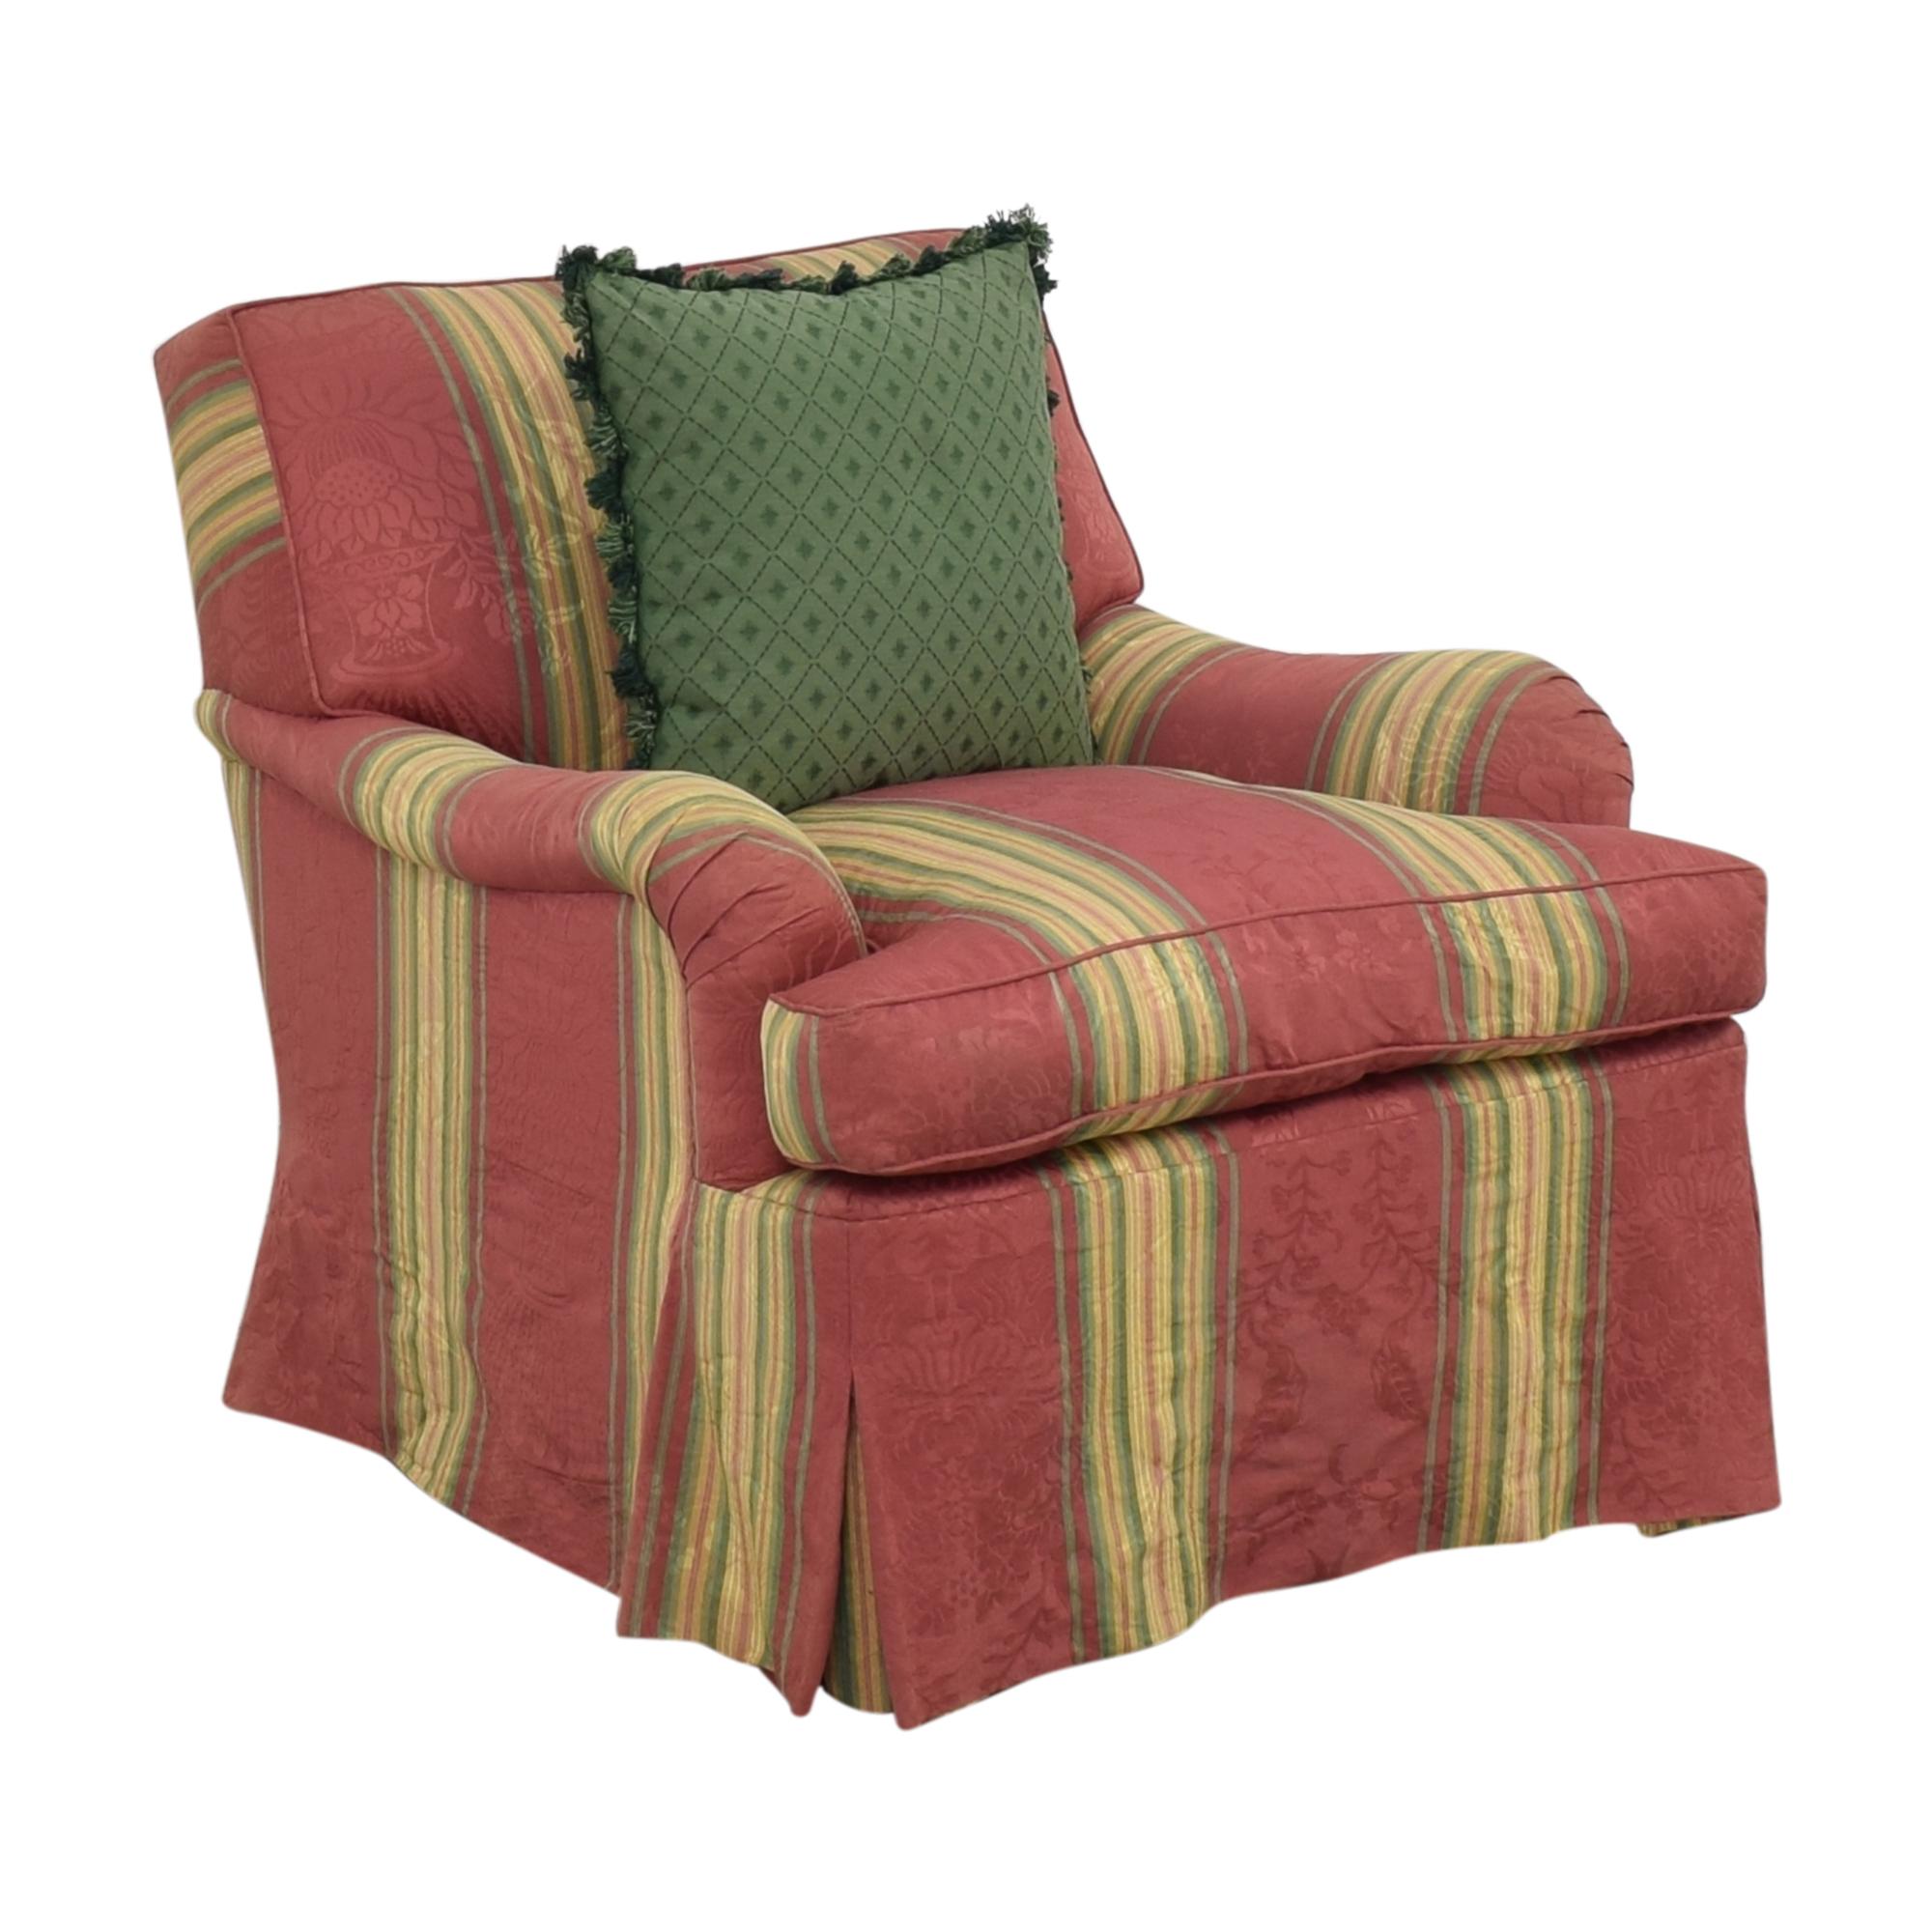 Bridgewater Accent Chair sale